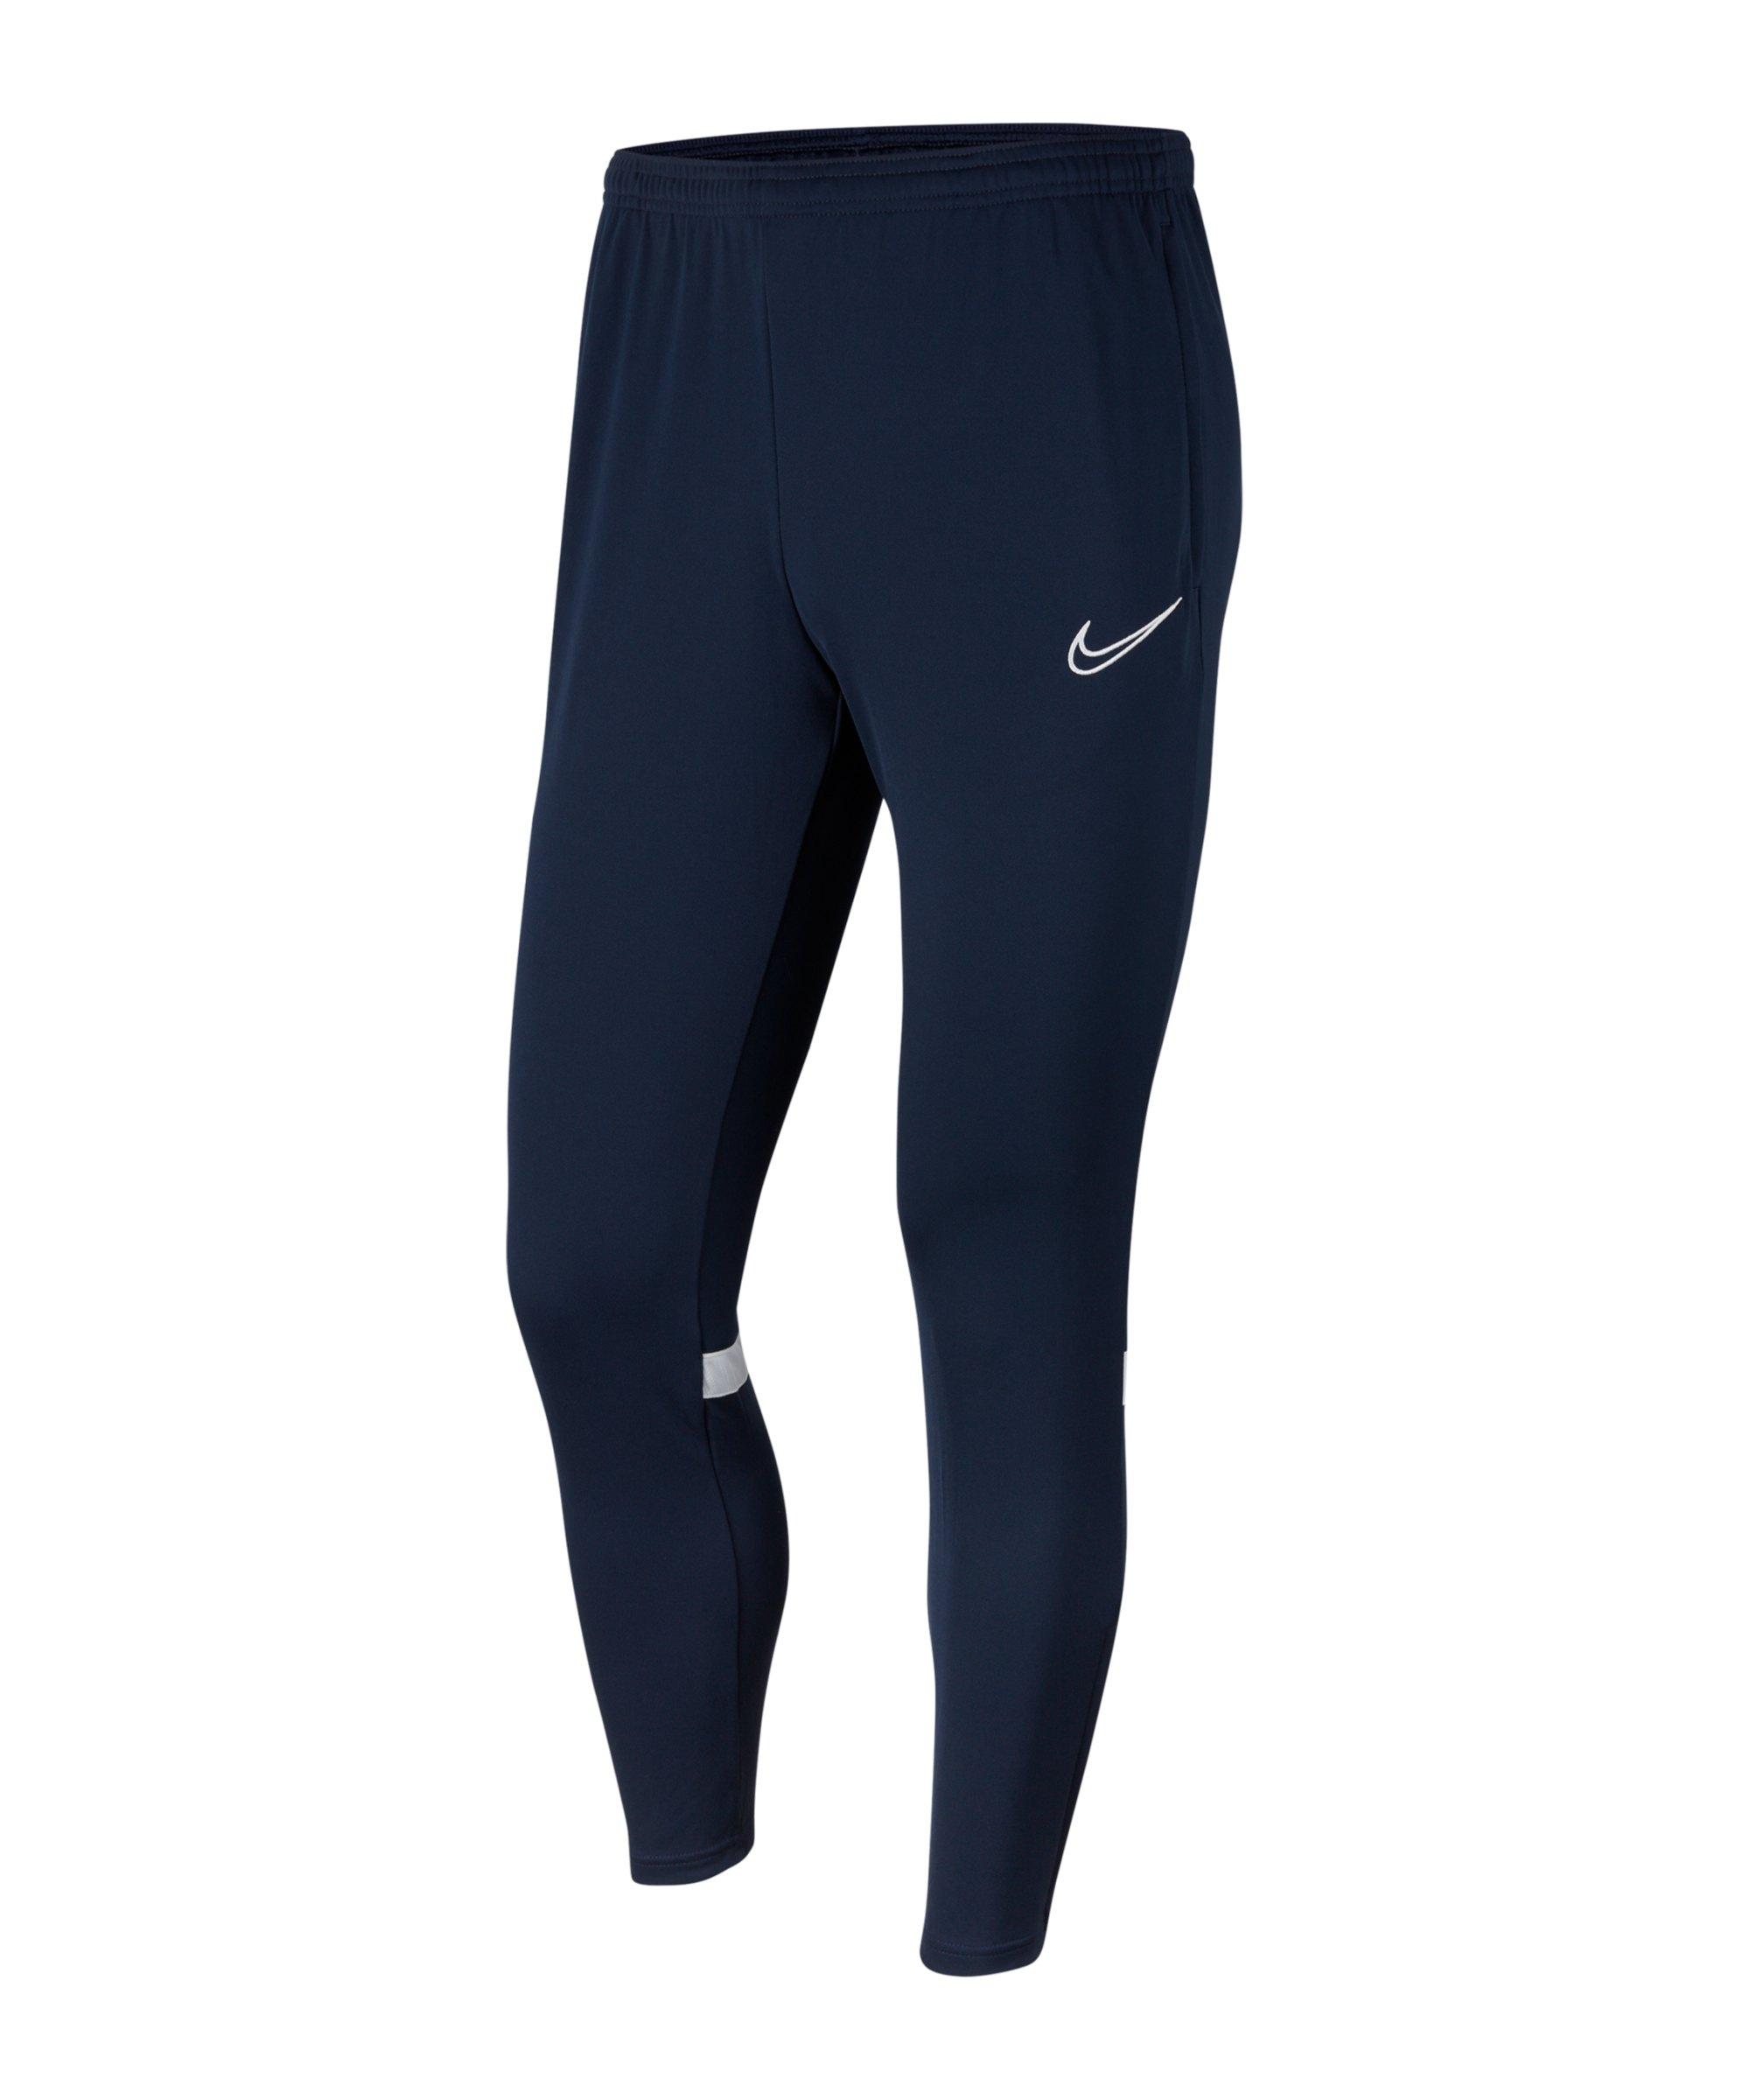 Nike Academy 21 Trainingshose Kids Blau Weiss F451 - blau